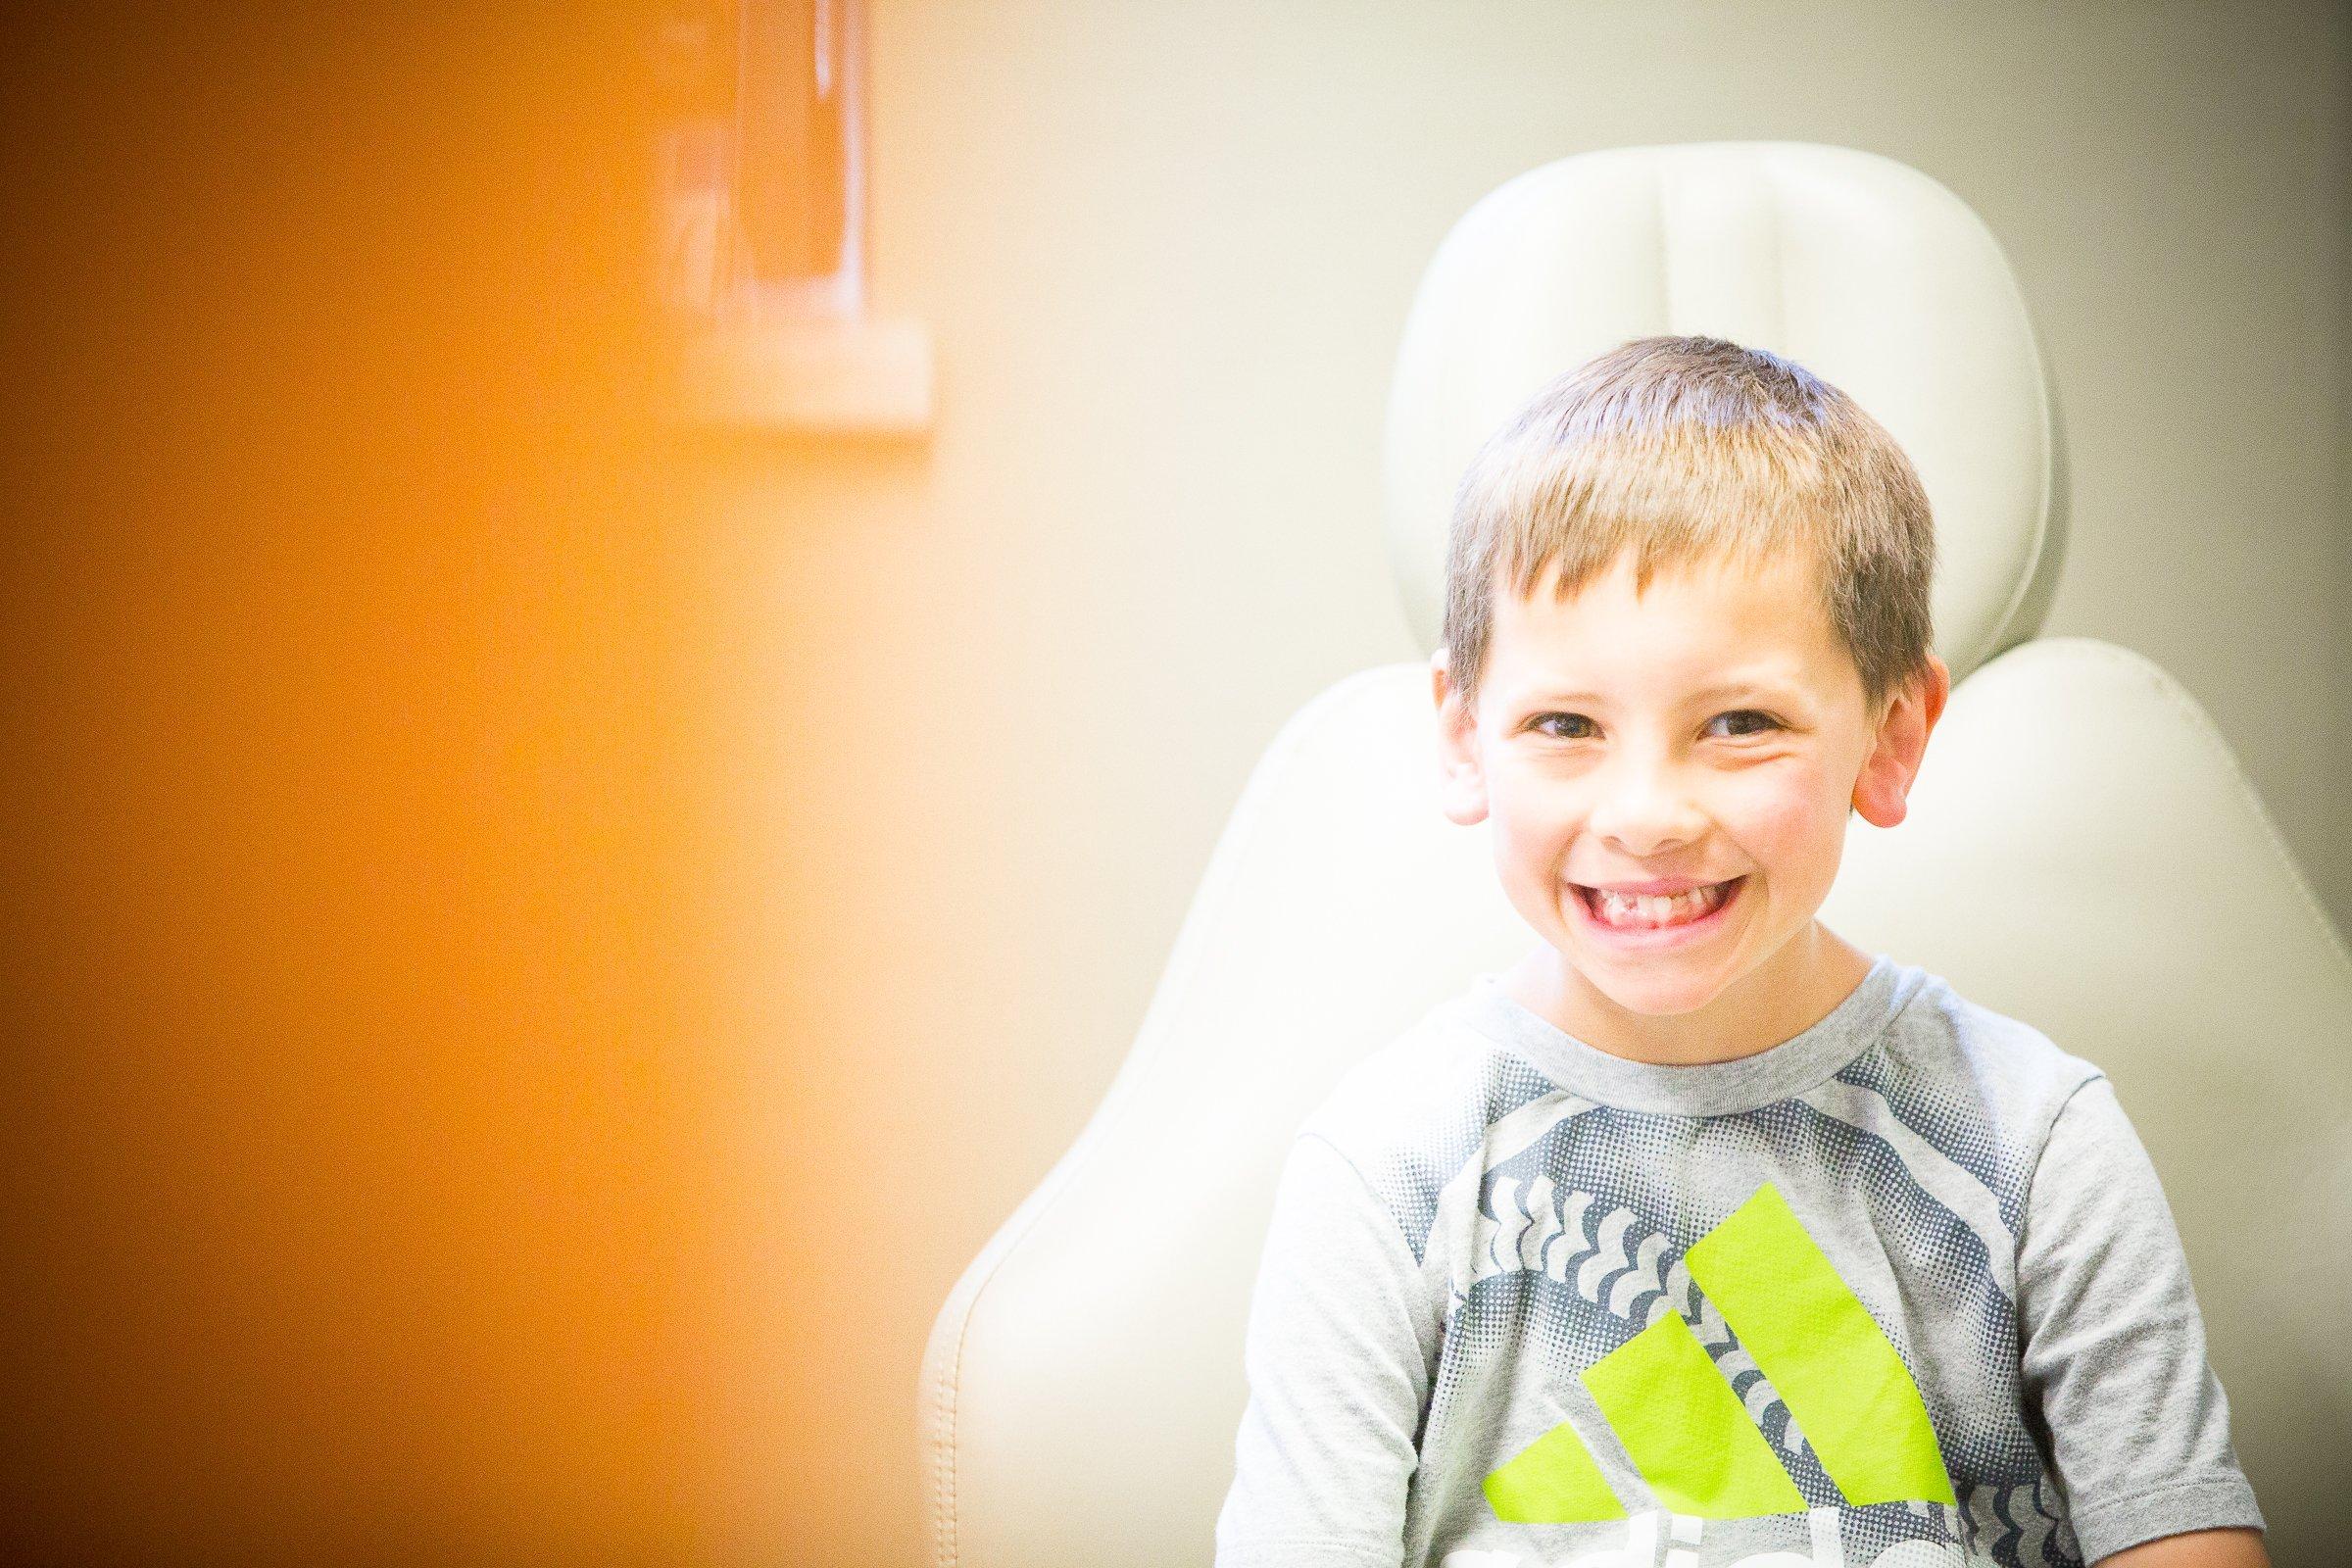 Advance-Orthodontics-Patient-Shots-41-of-50 Our Favorite Pictures